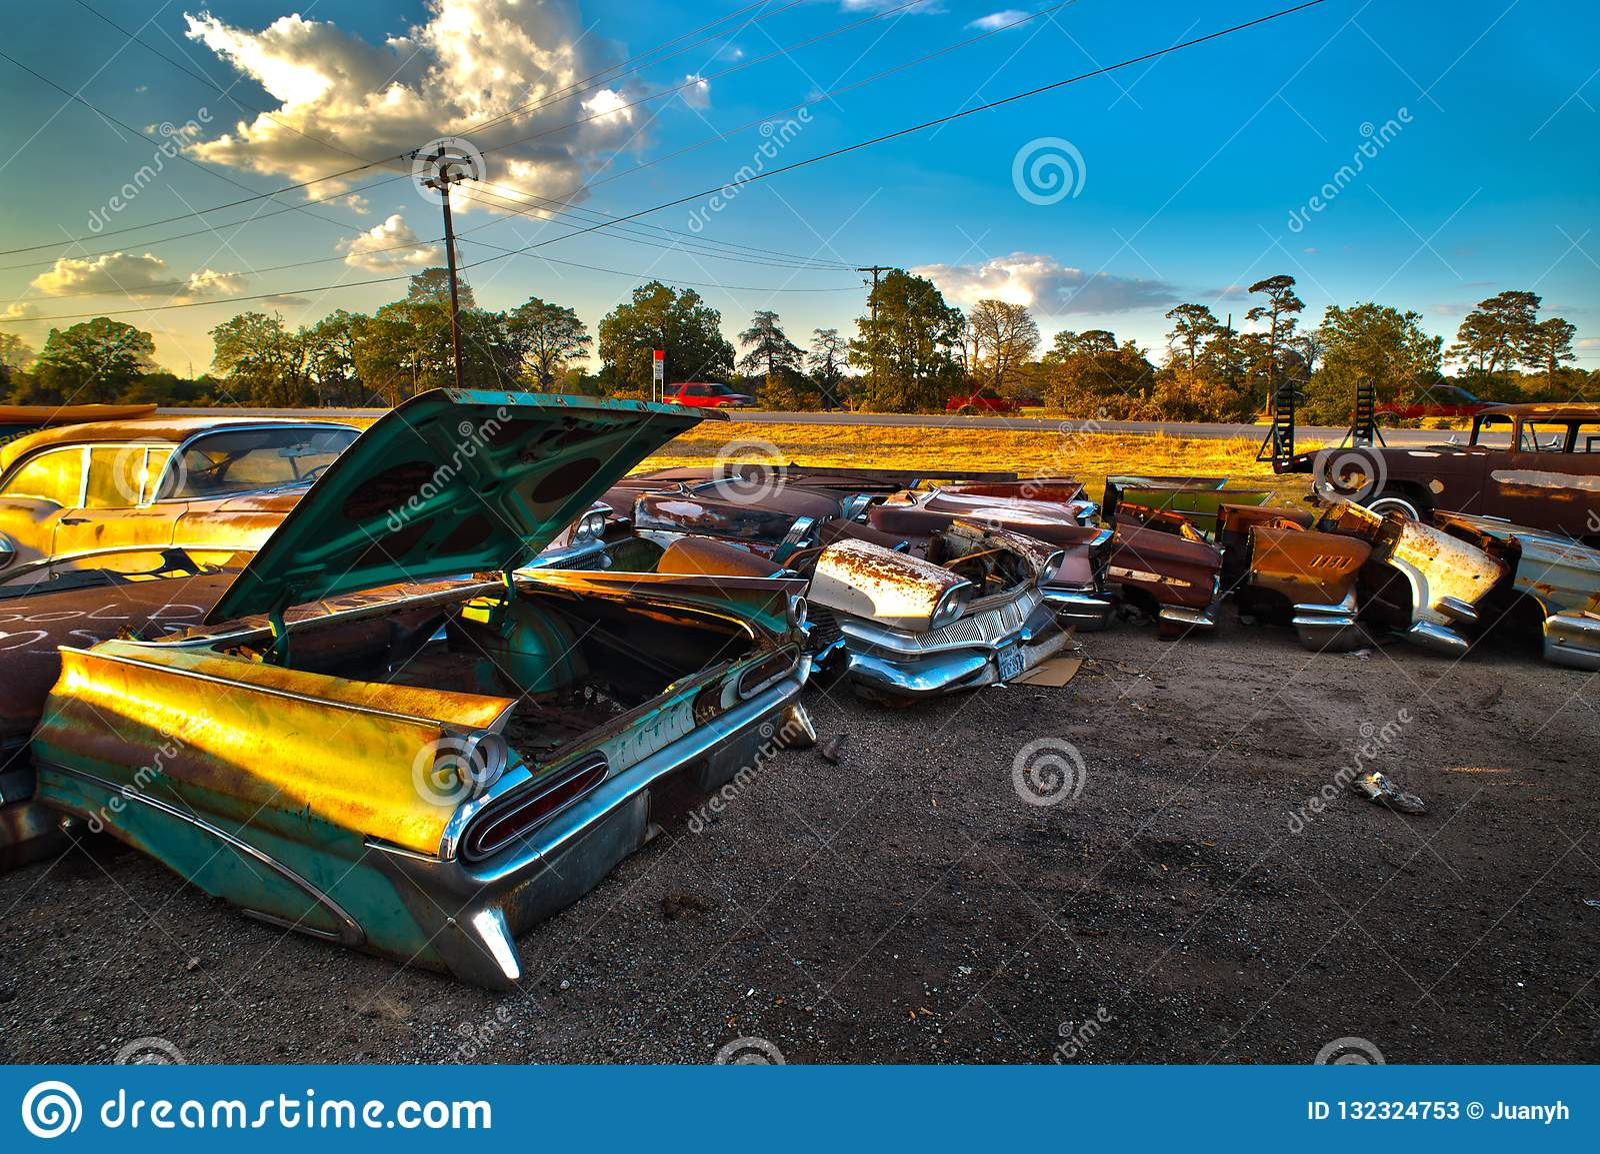 Classic Car Salvage Yards In Texas ✓ Volkswagen Car